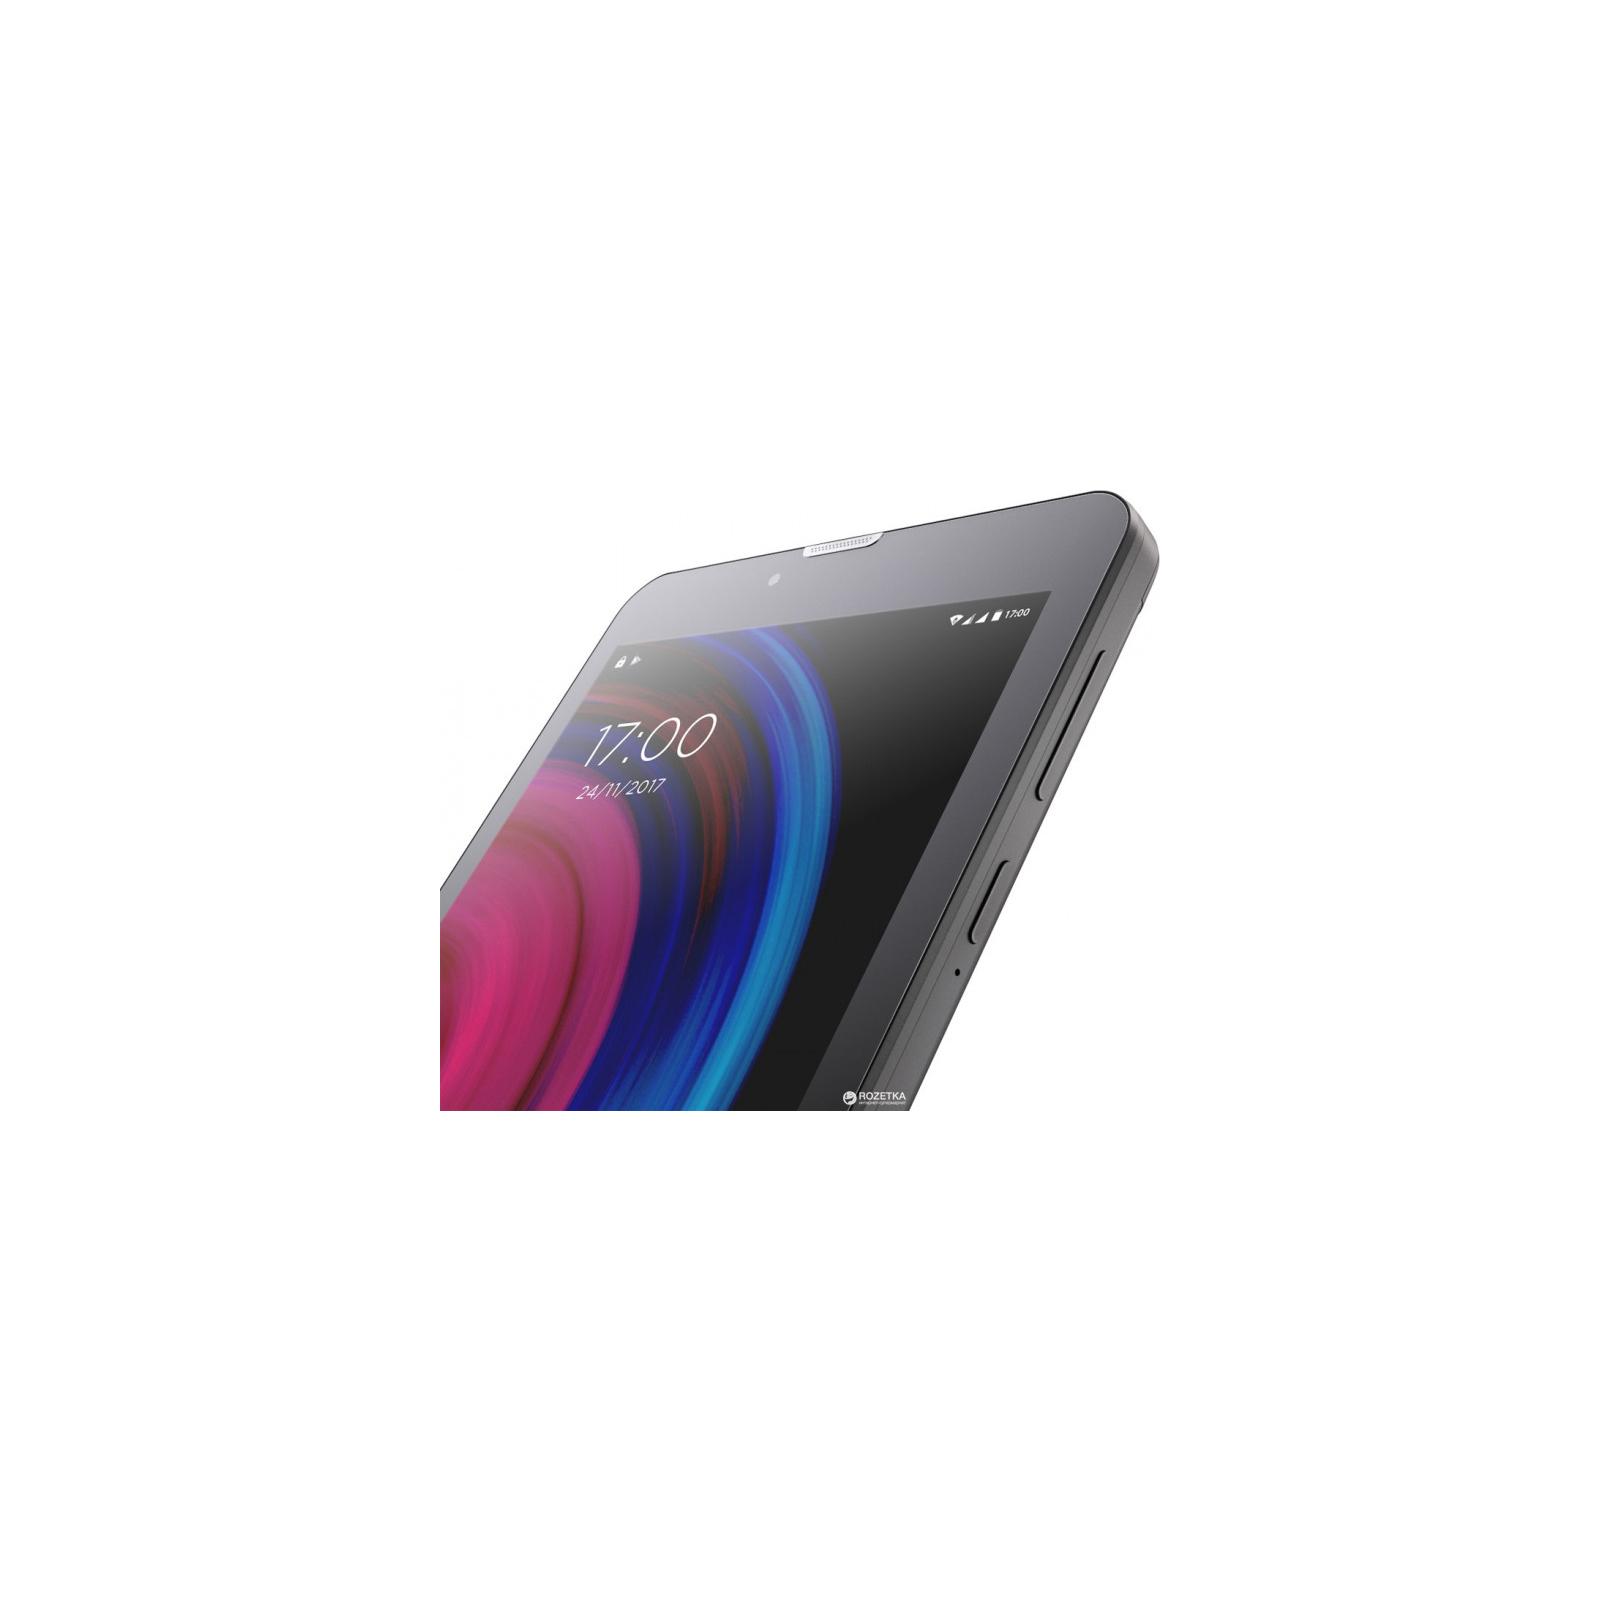 Планшет Pixus Touch 7 3G (HD) 2/16GB Metal, Black (4897058531213) изображение 5